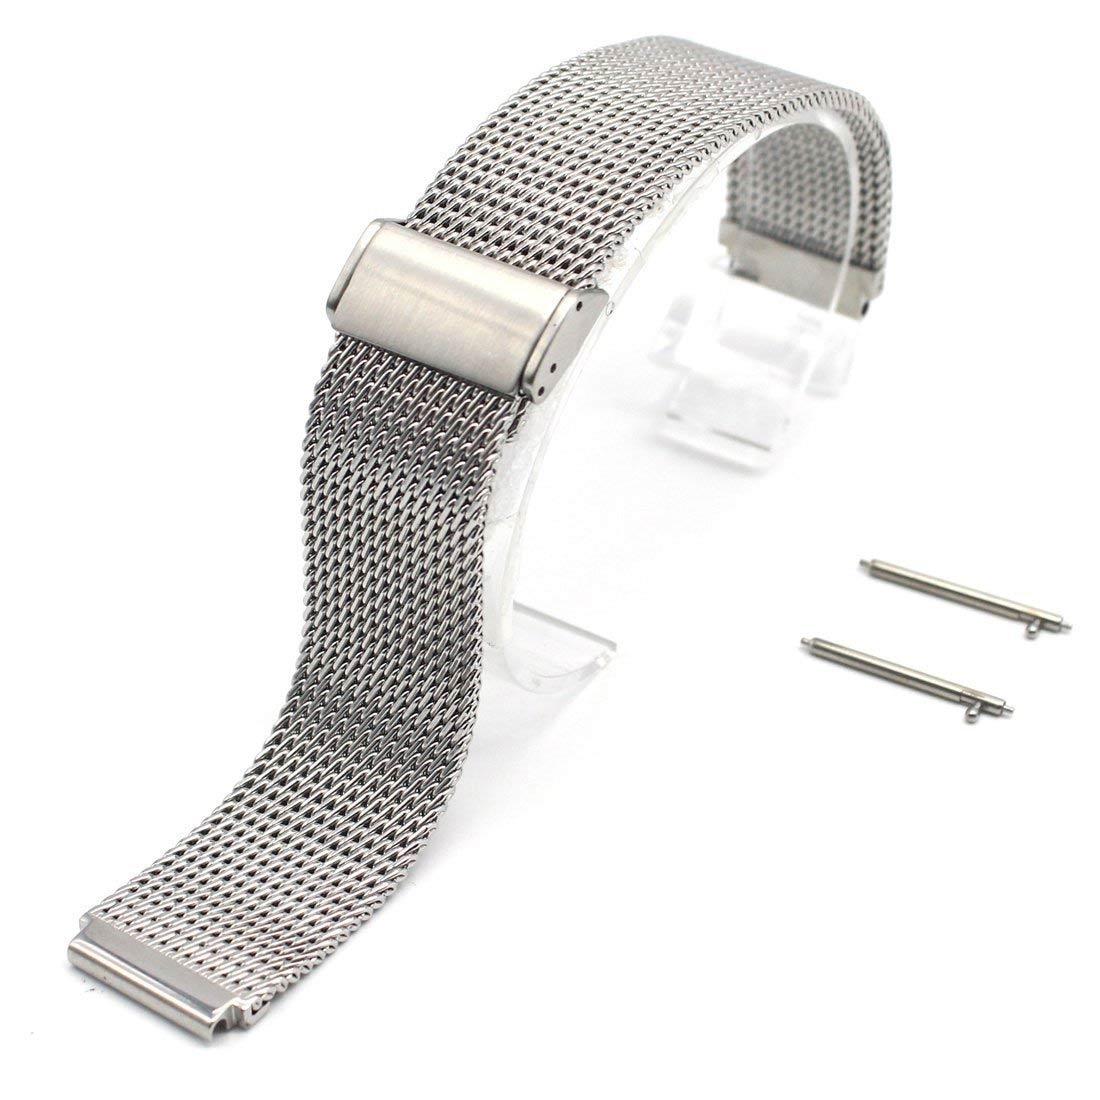 milanaise-armband-wechseln